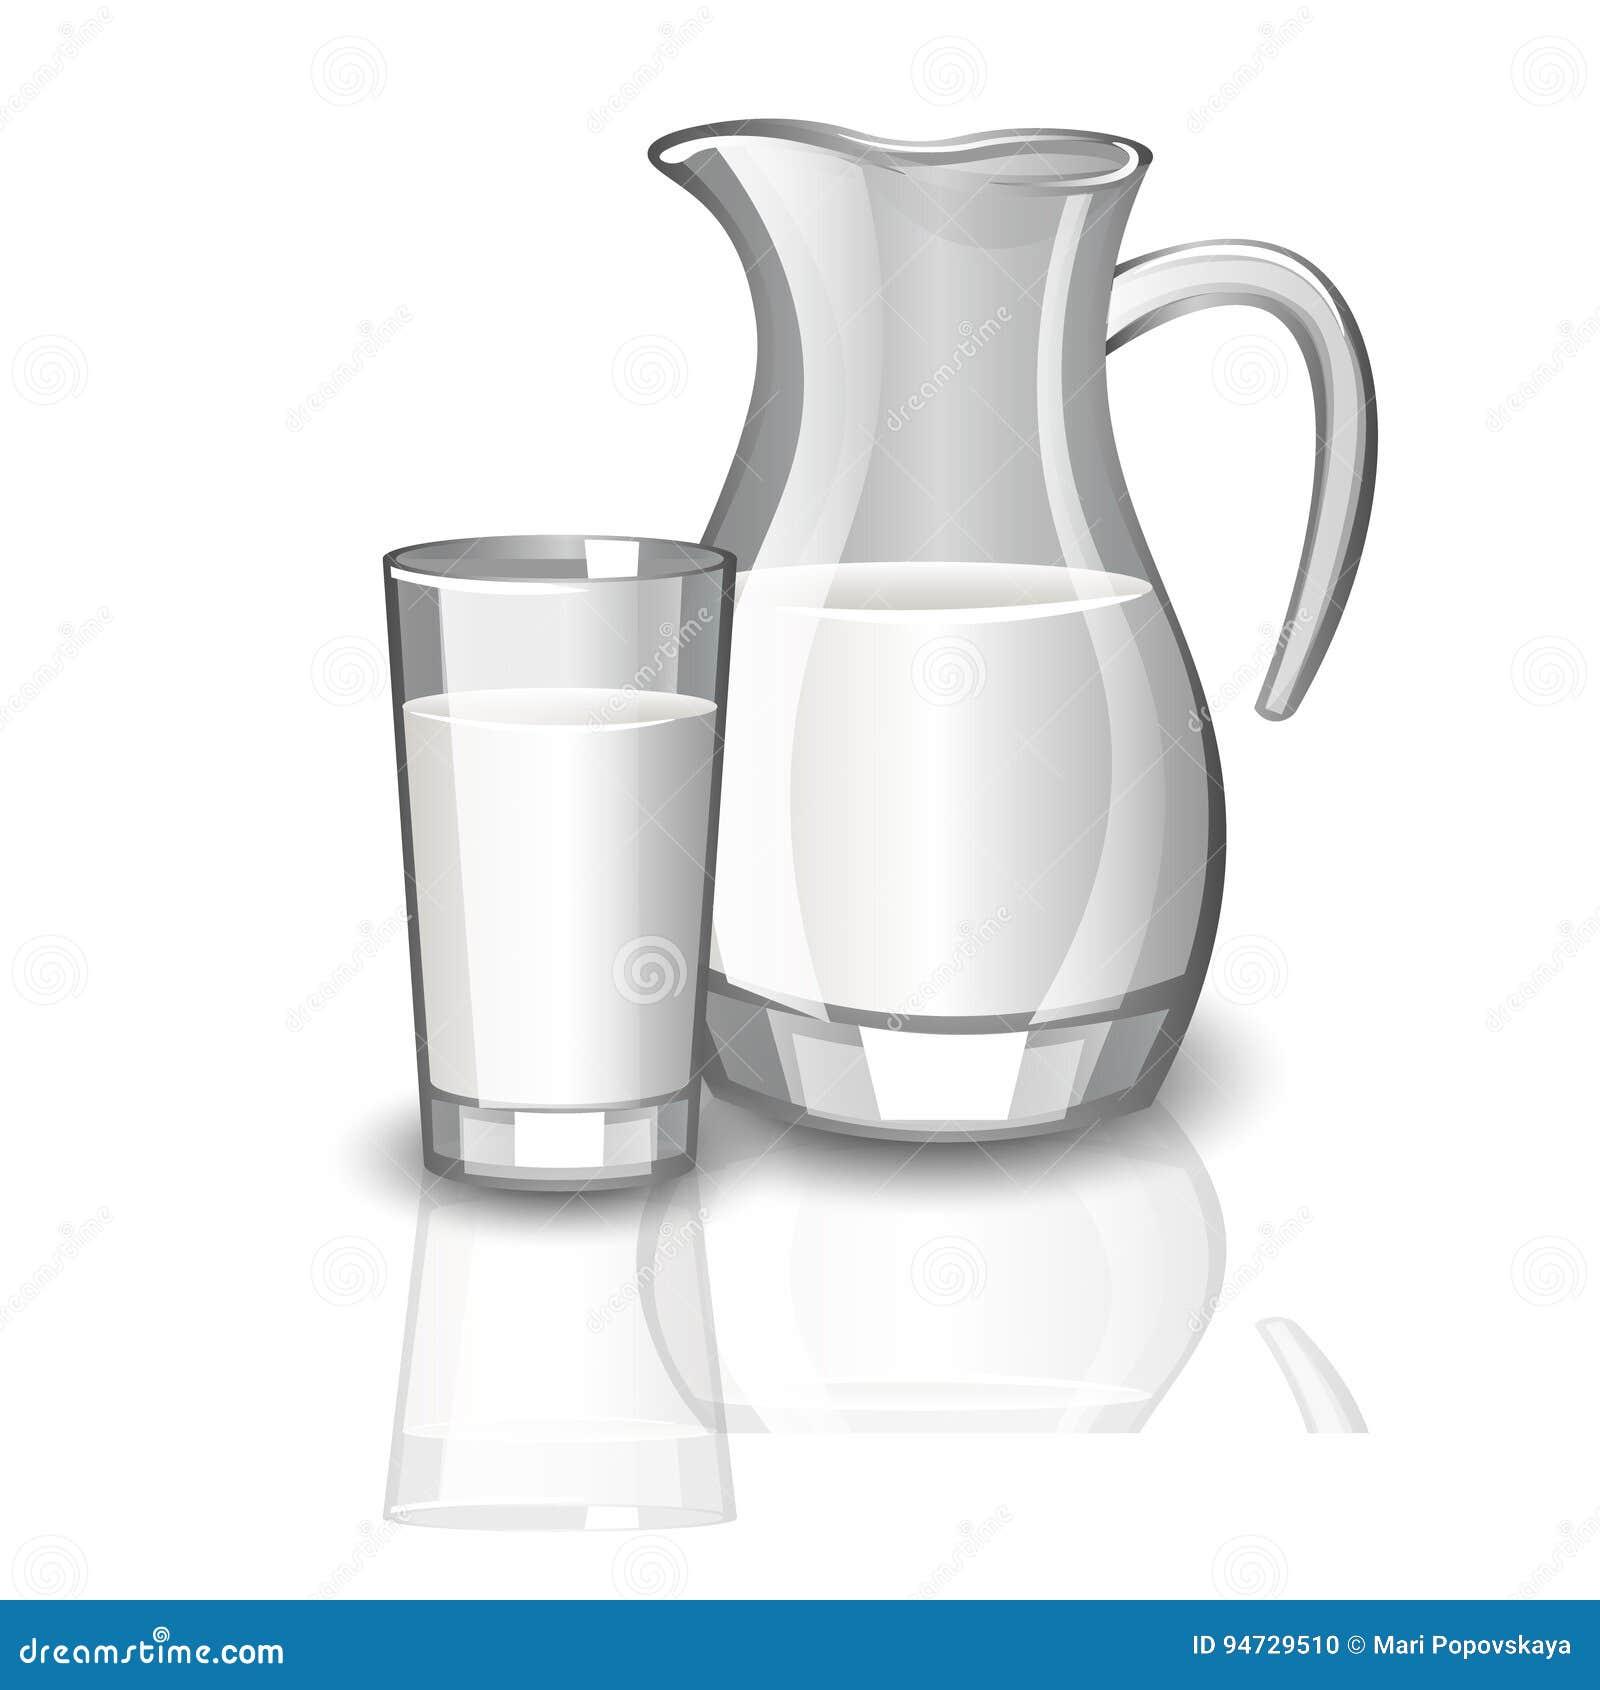 Milk carafe, cup of milk.